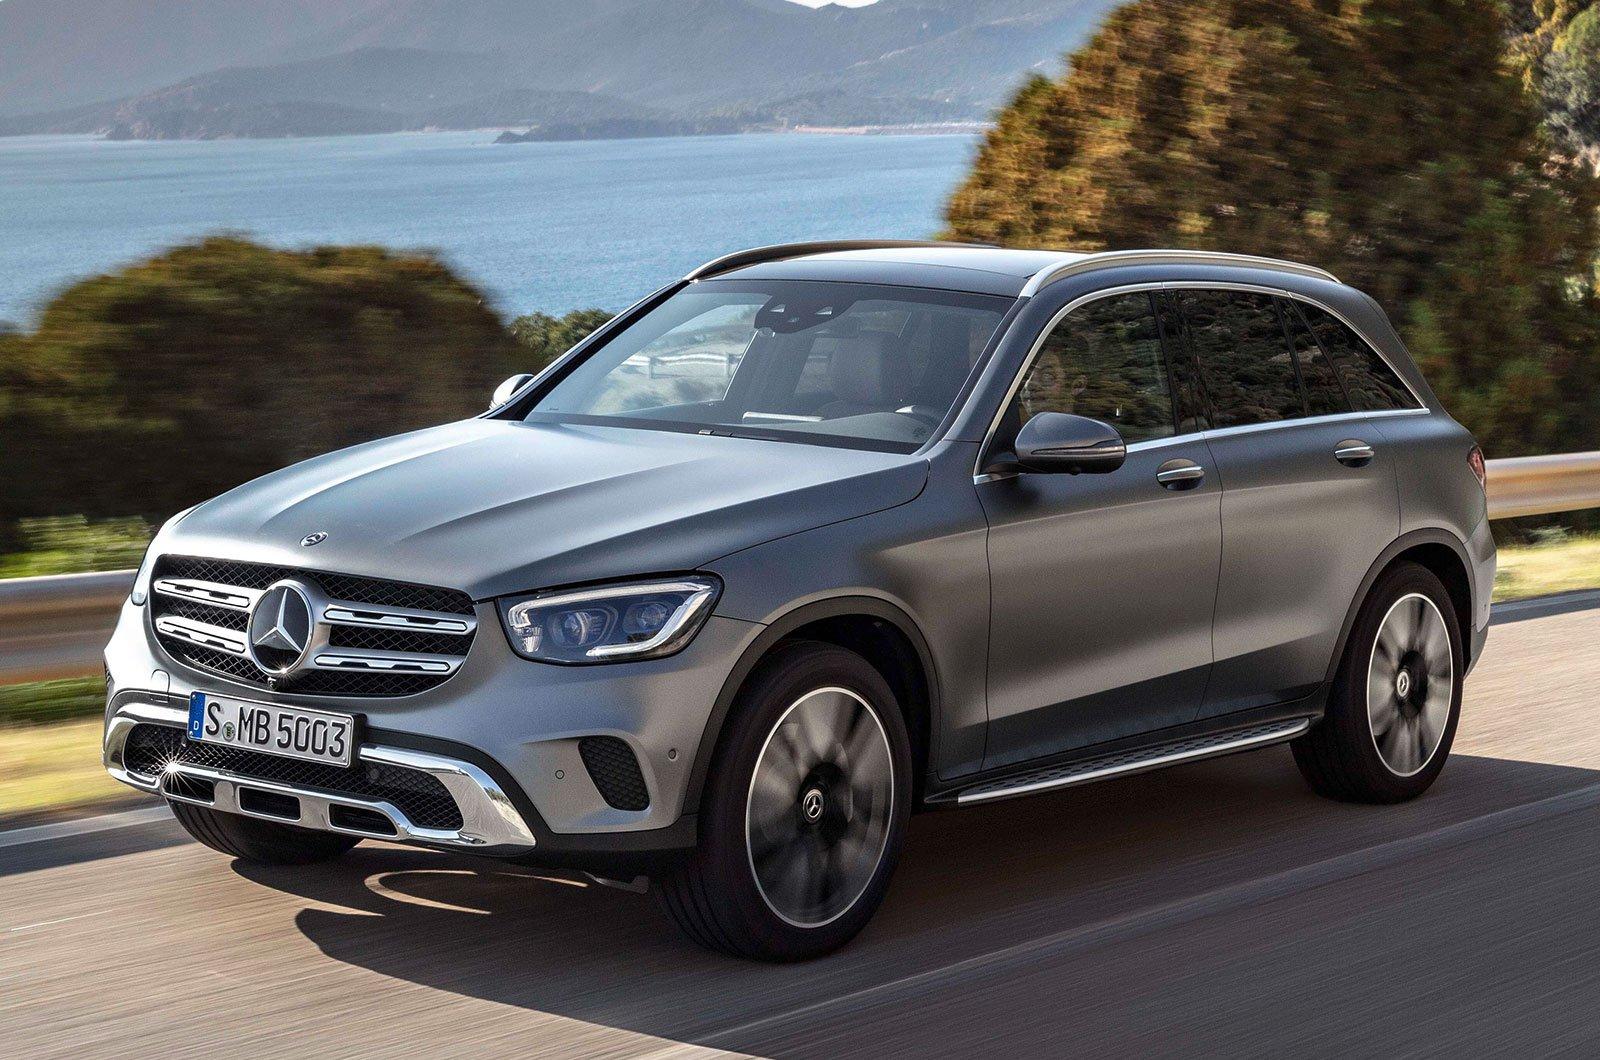 2019 Mercedes GLC front